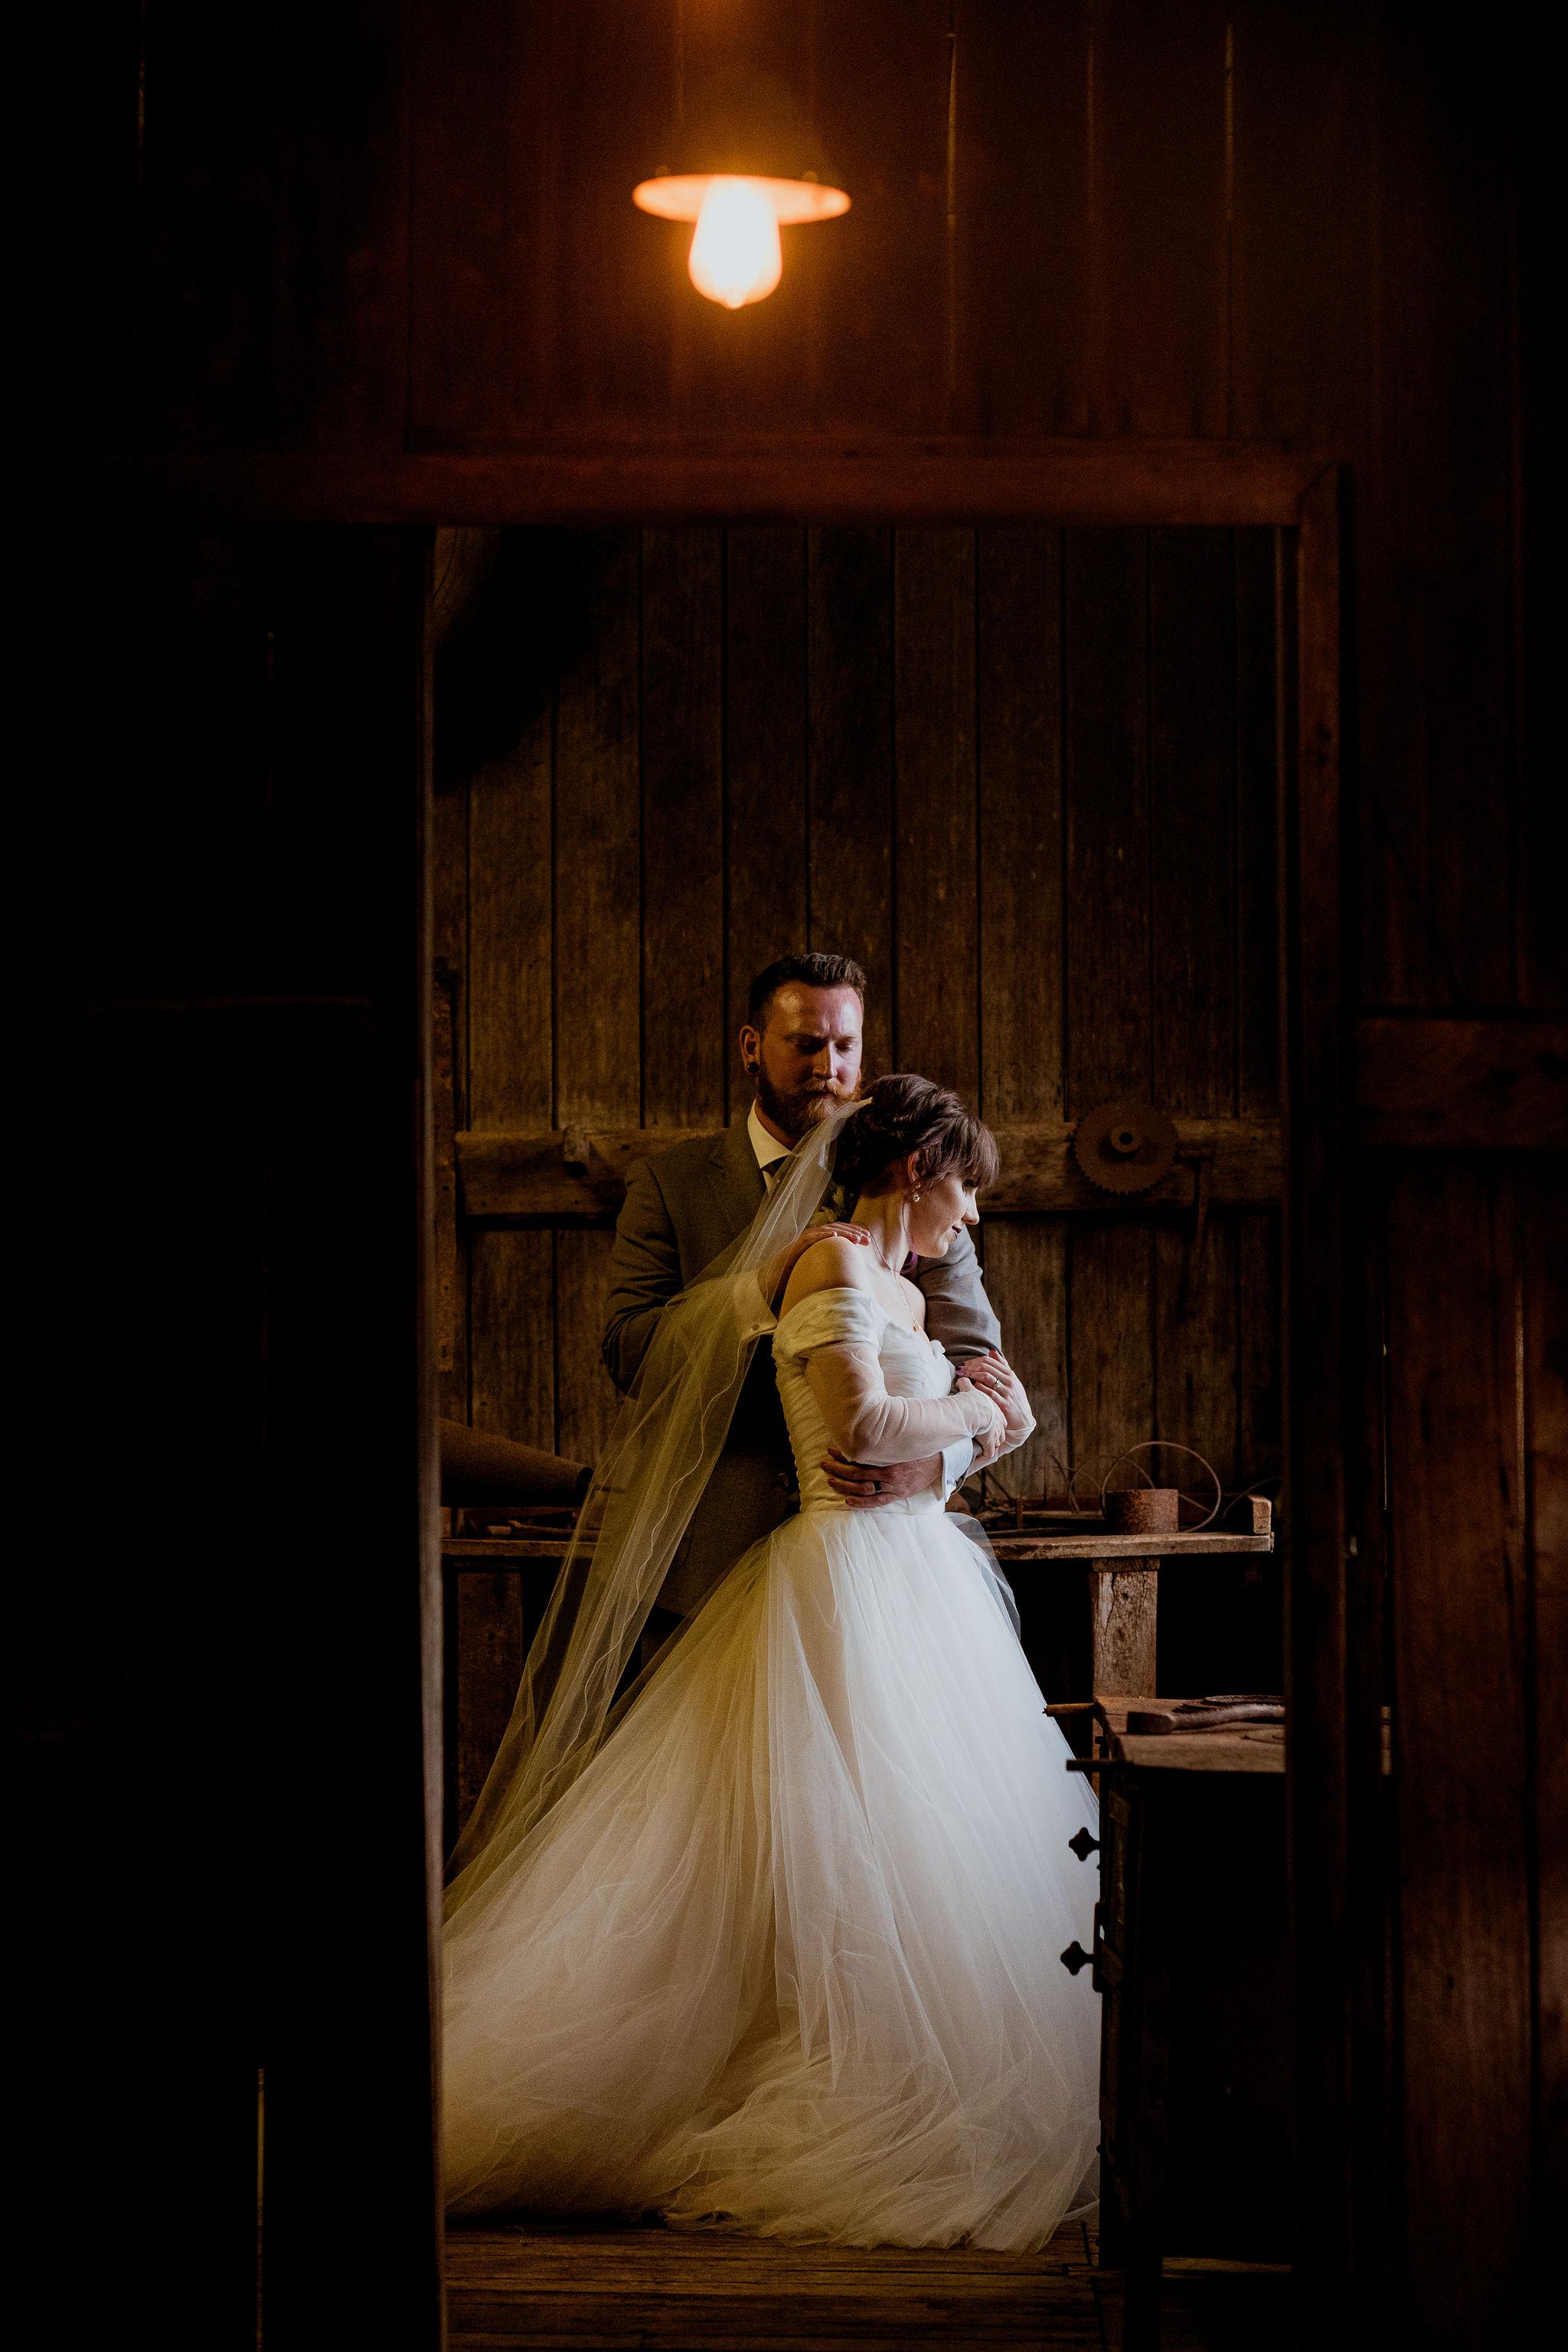 Bride and groom hugging in a rustic wooden workshop